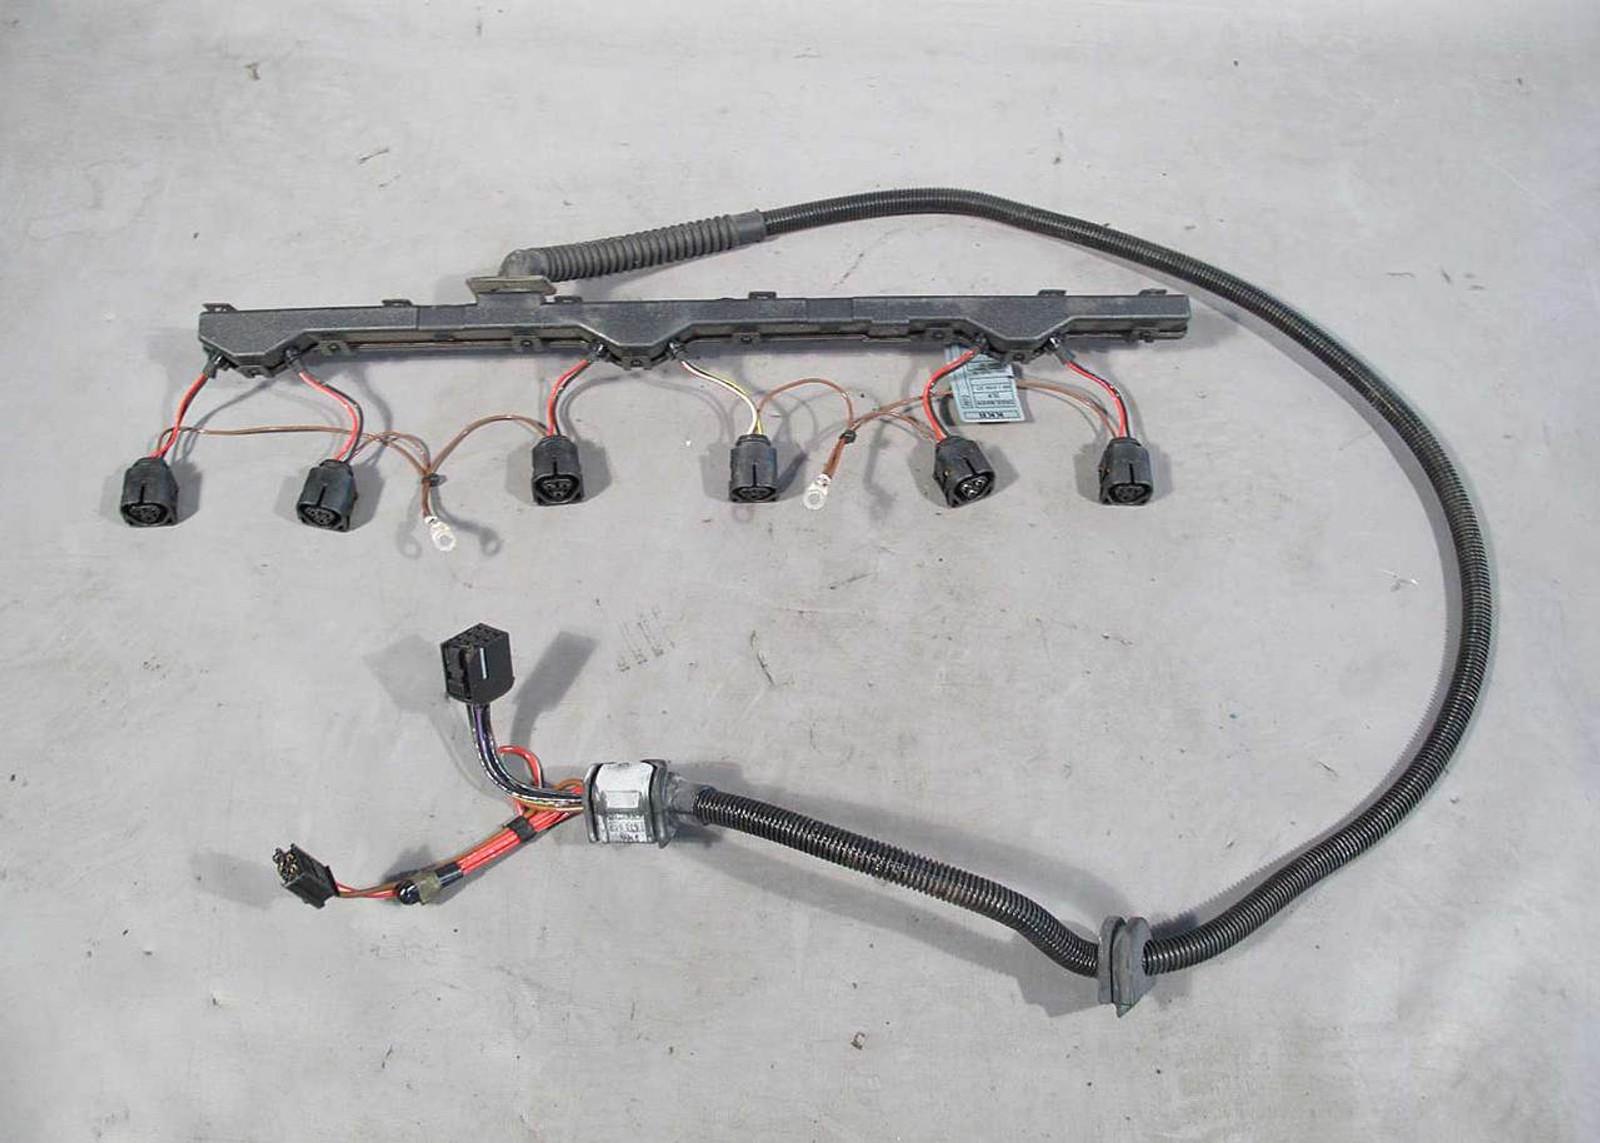 bmw e83 x3 sav m54 2 5i 3 0i engine ignition coil wiring harness rh prussianmotors com 06 Stratus Ignition Coil Wiring Harness Audi Ignition Coil Wiring Harness